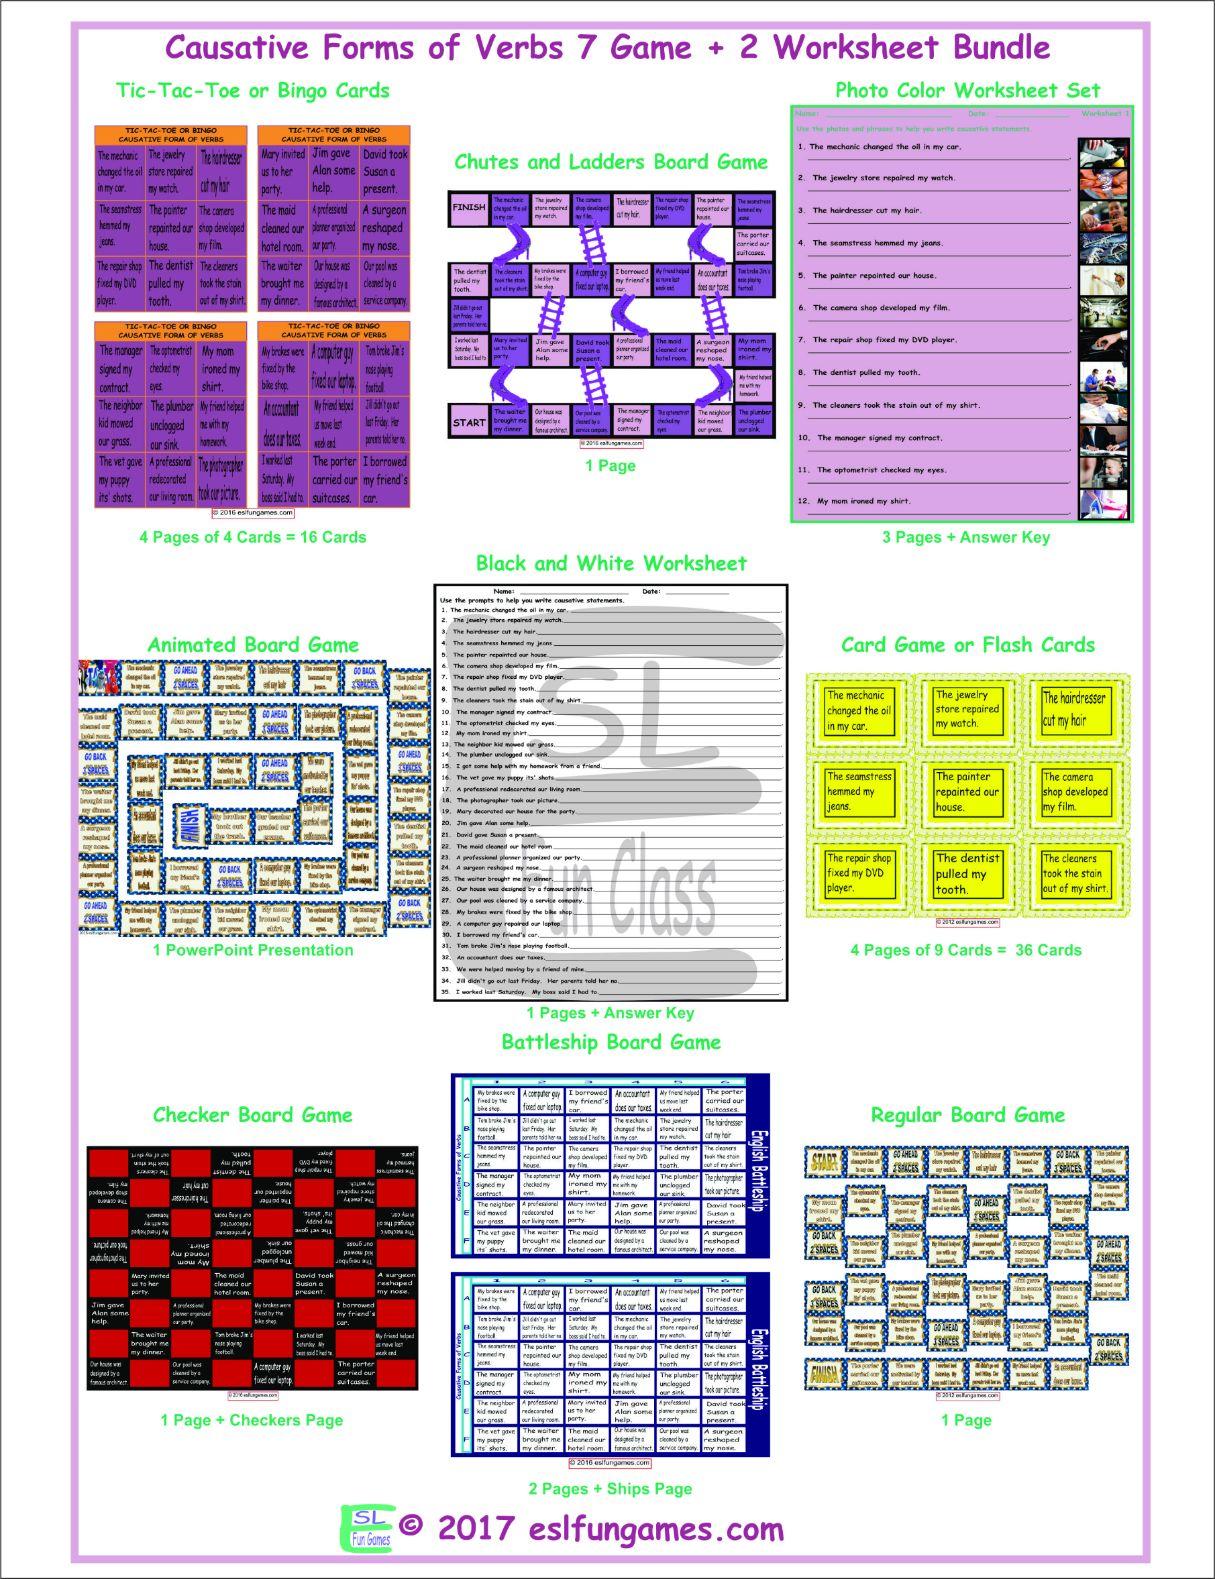 Causative Forms Of Verbs 7 Game Plus 2 Worksheet Bundle